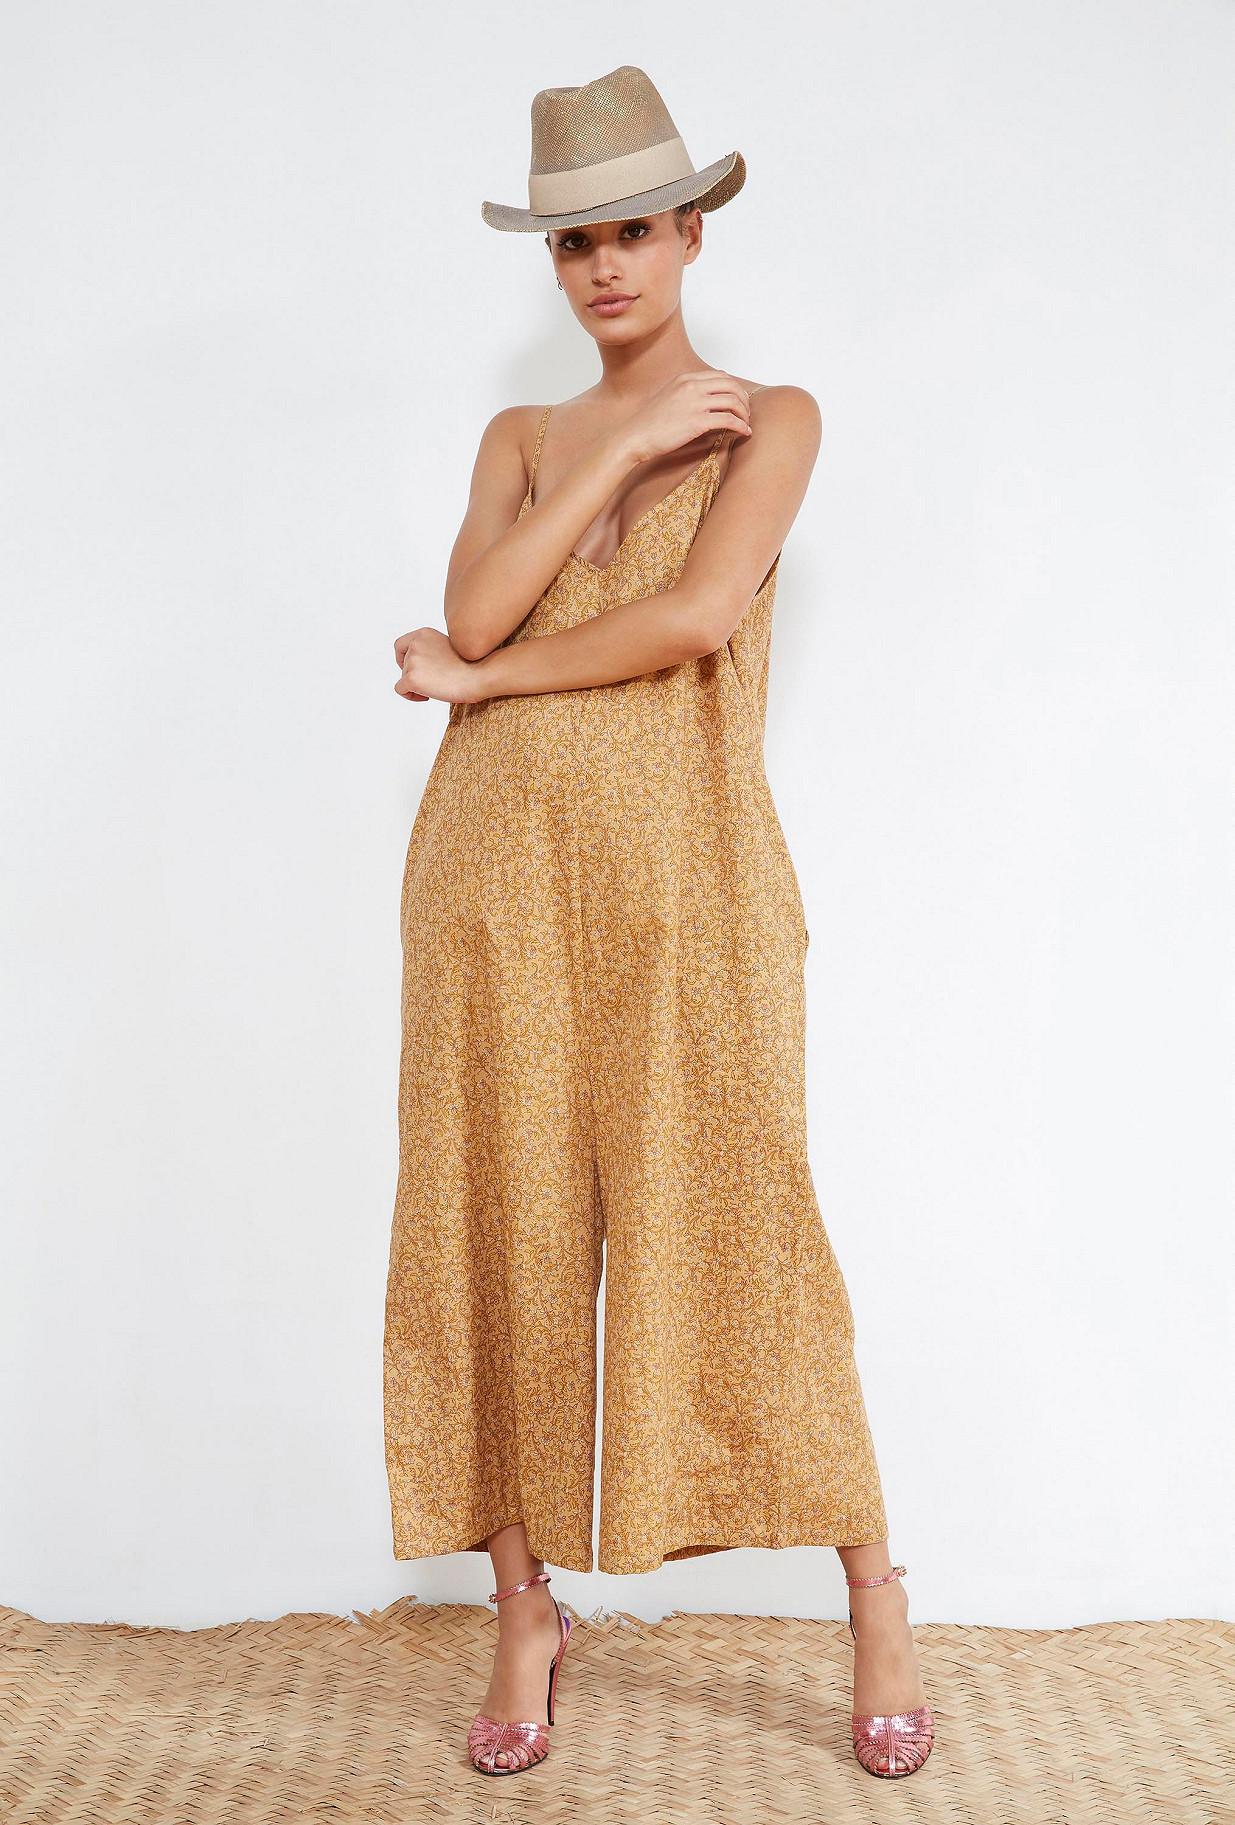 clothes store PANTS  Albertine french designer fashion Paris